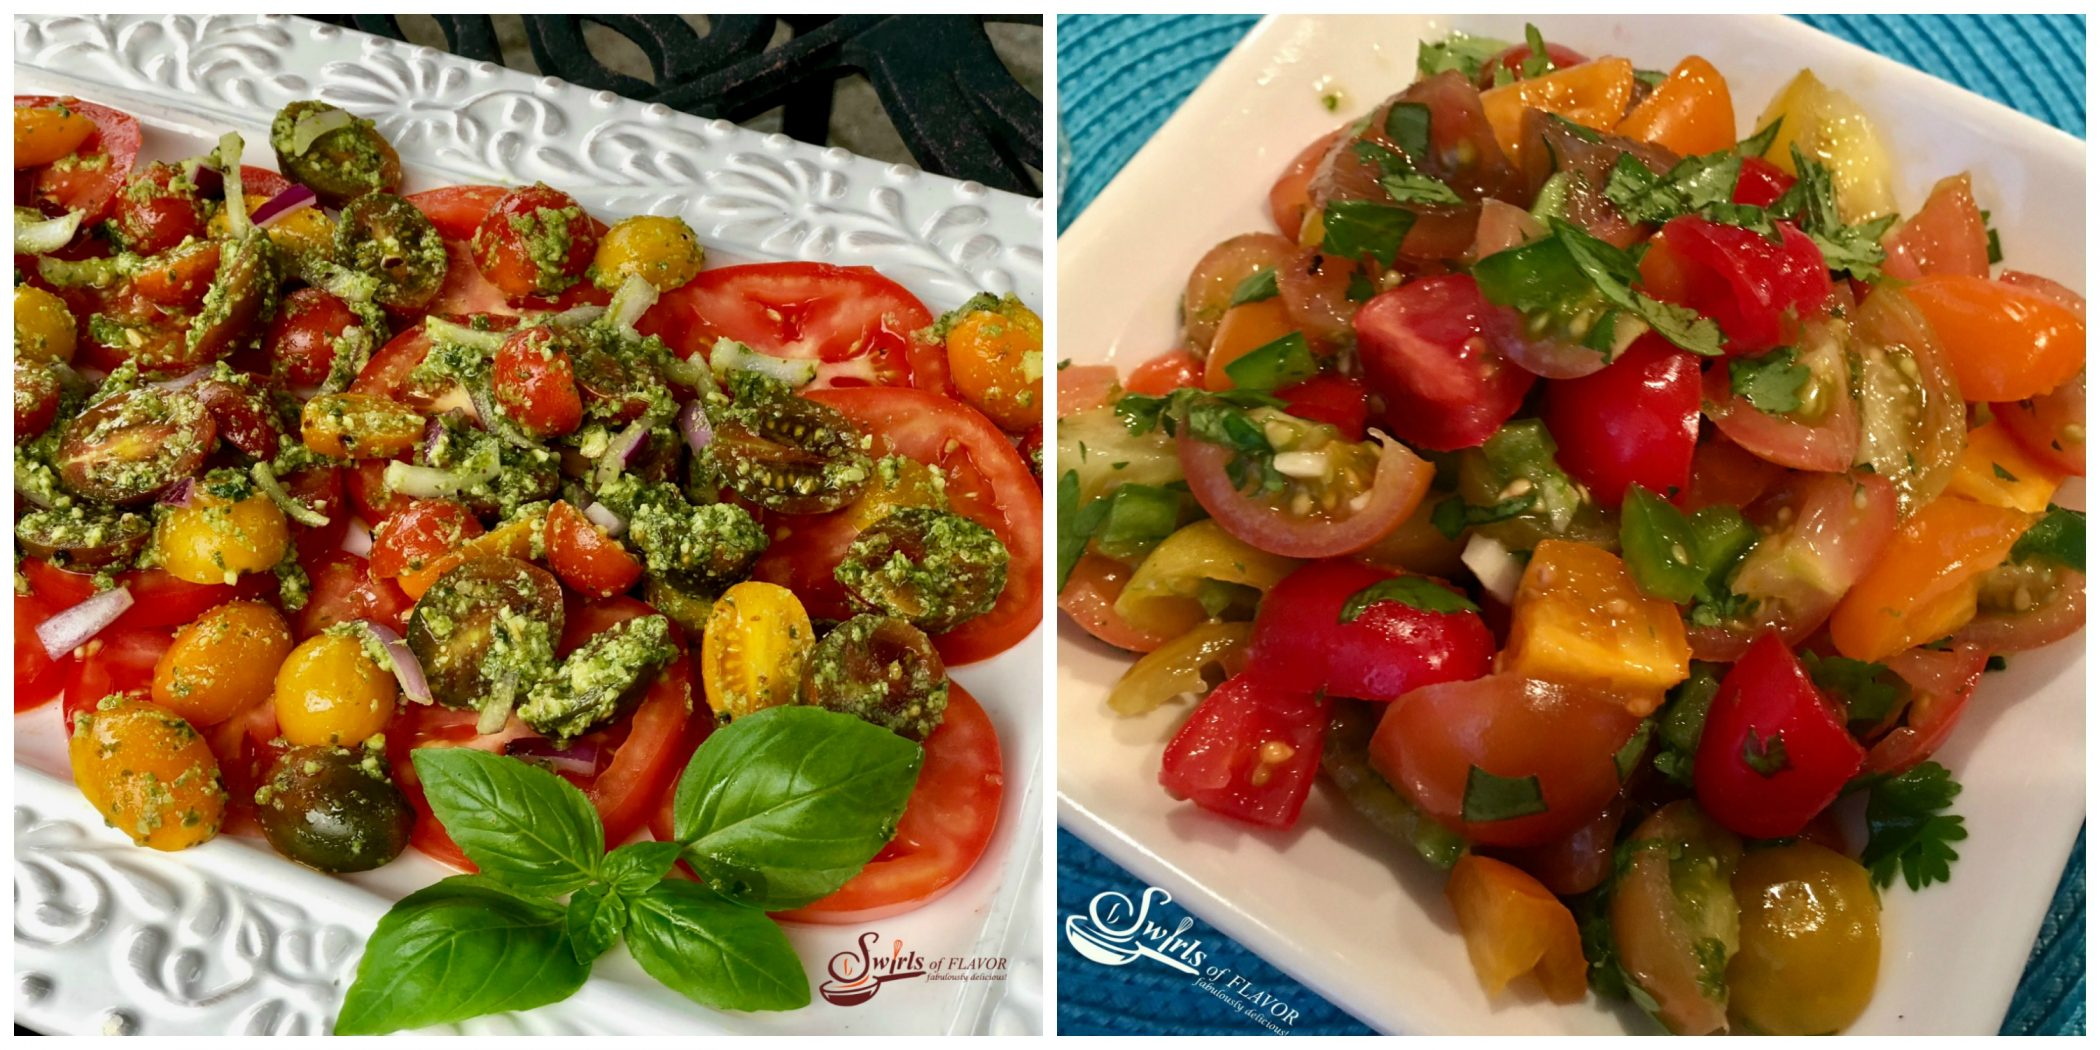 Tomato Pesto Salad and Heirloom Tomato Salsa